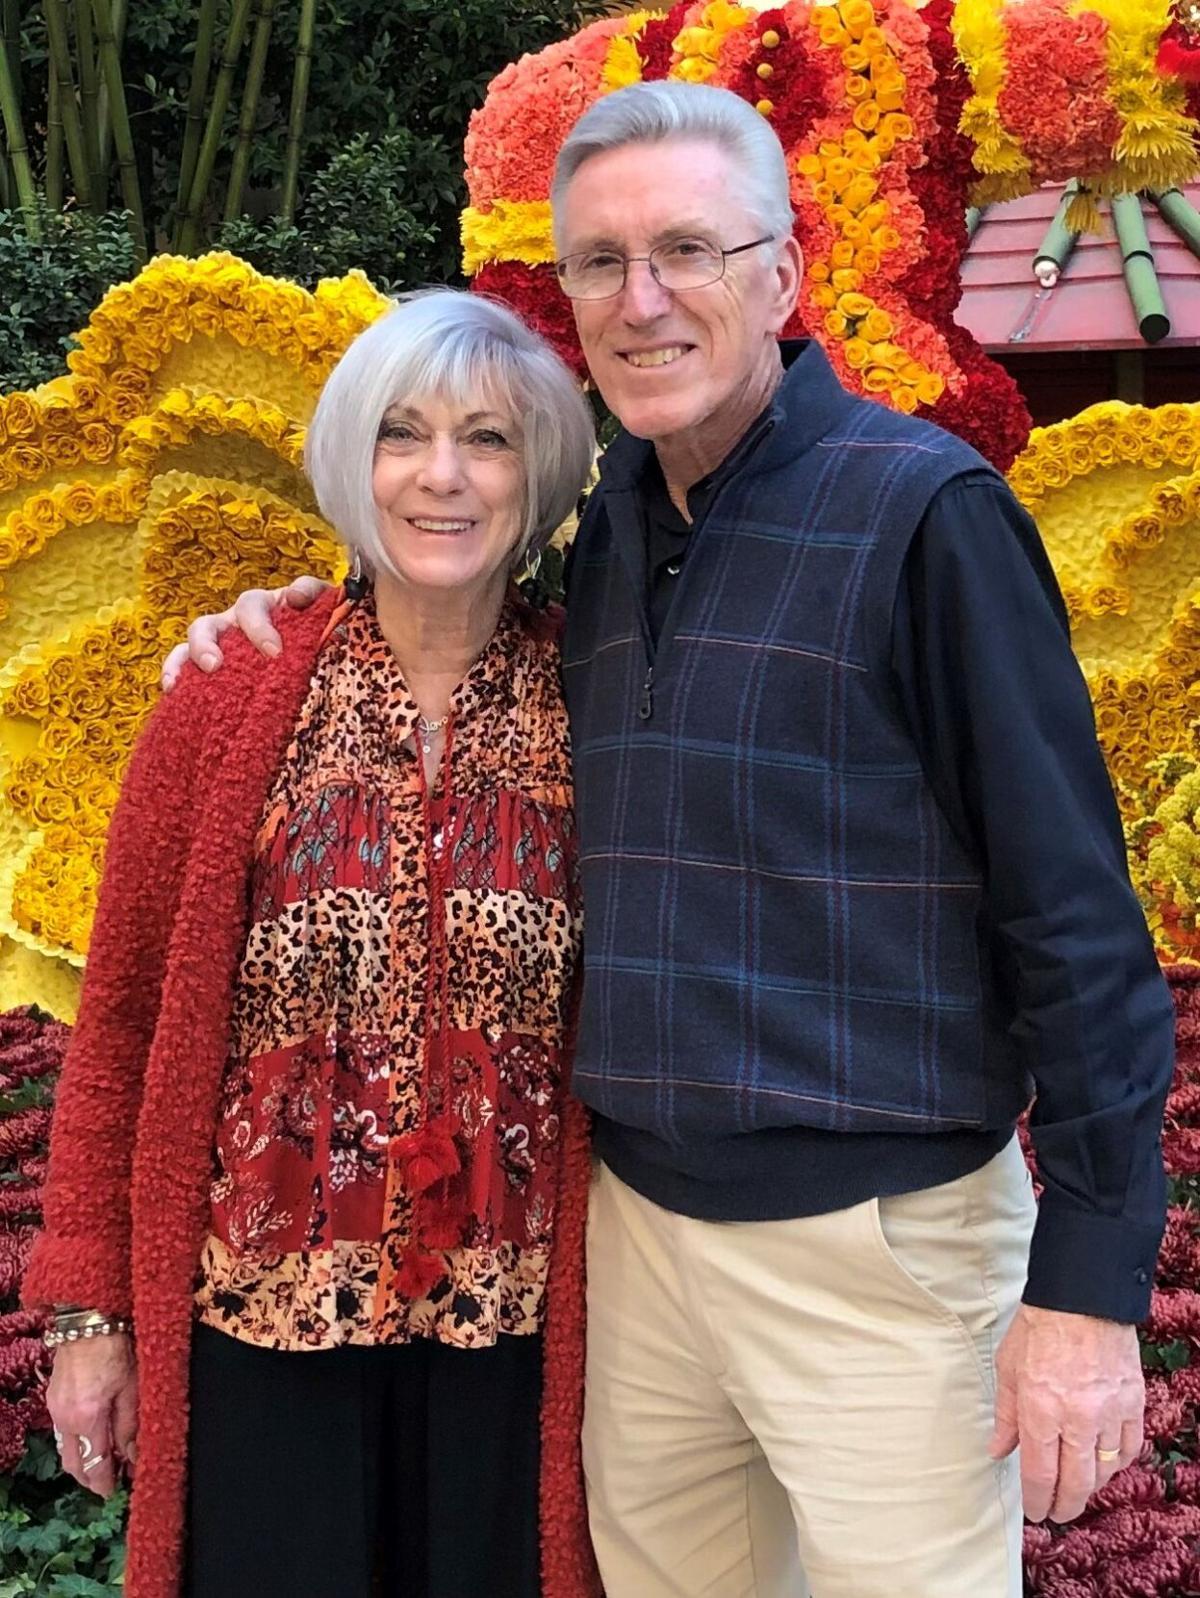 Bill & Rosemary pic2